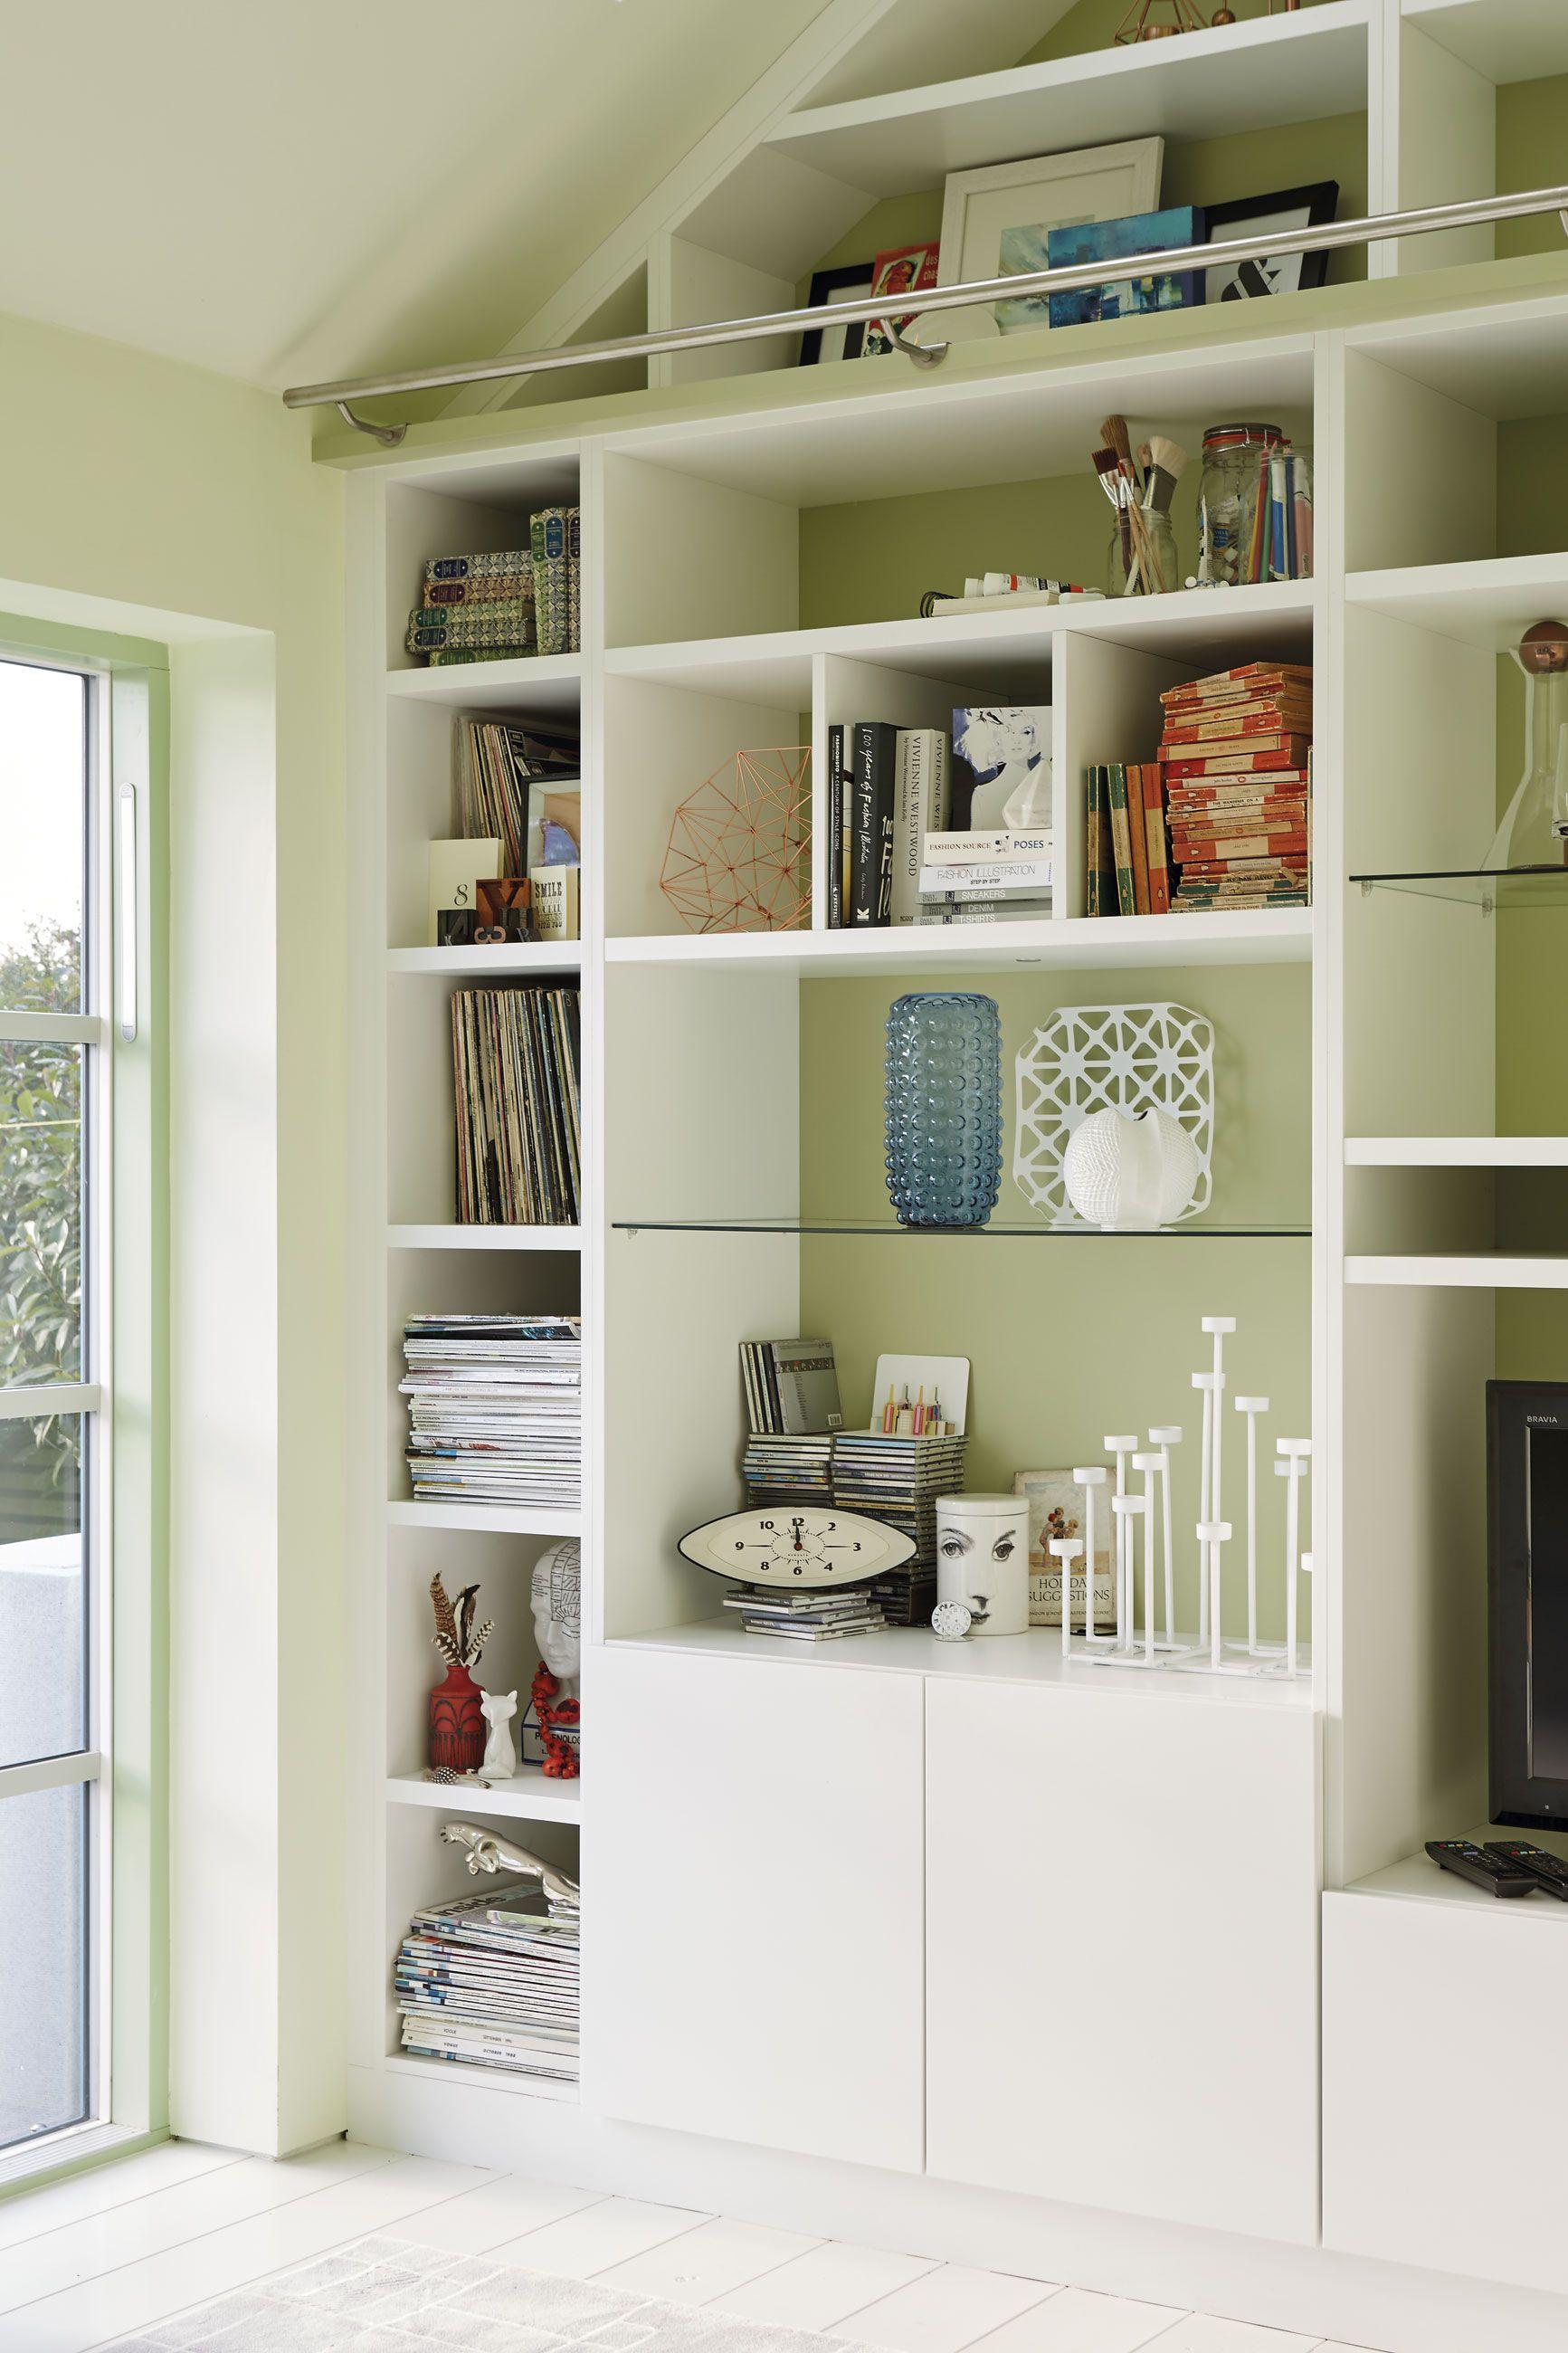 Bespoke Bookshelves Large Bookcase Ceiling Storage Small Study Area